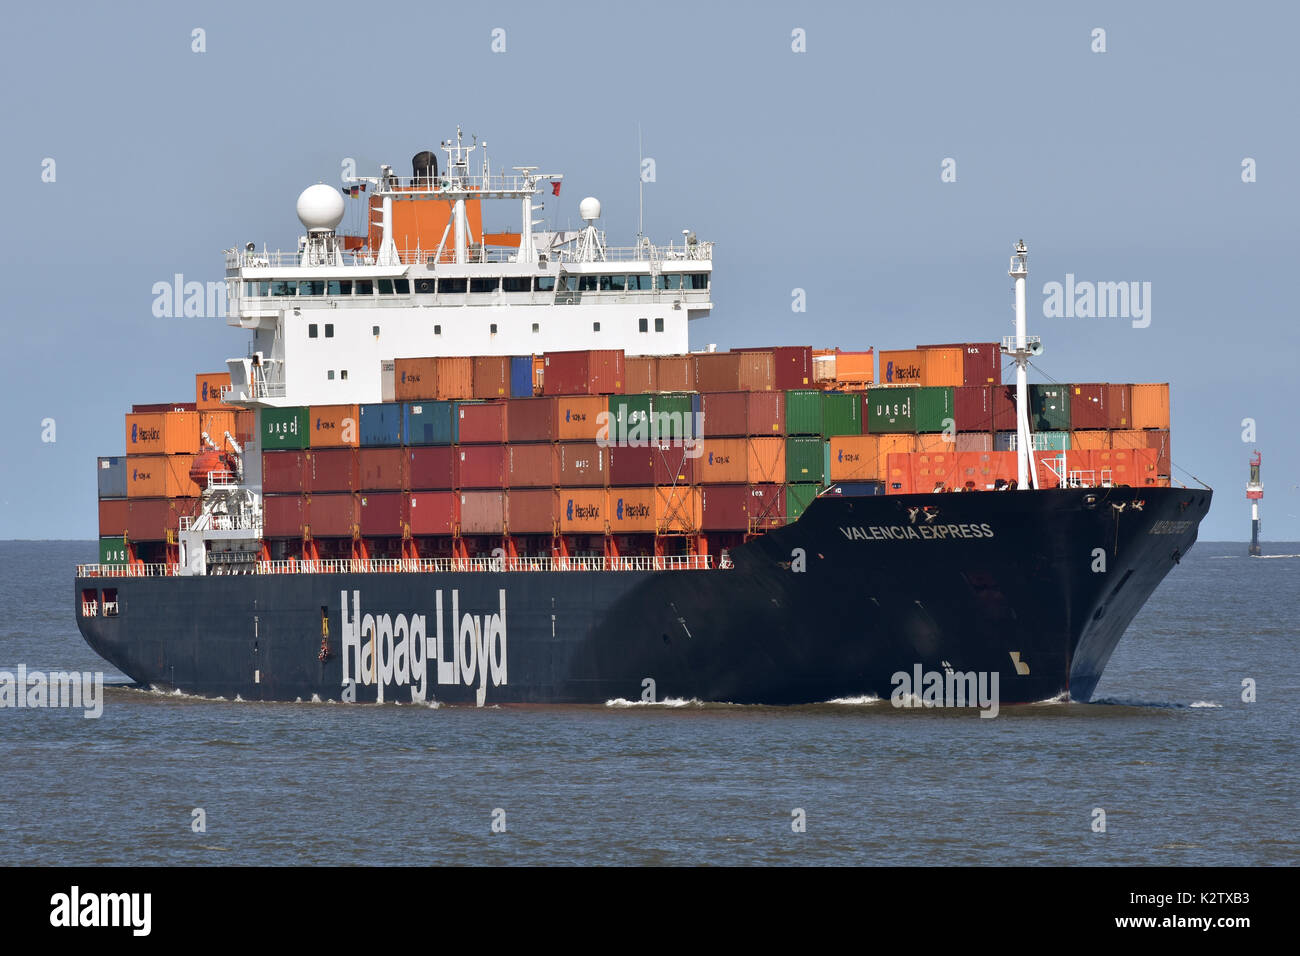 Valencia Express - Stock Image